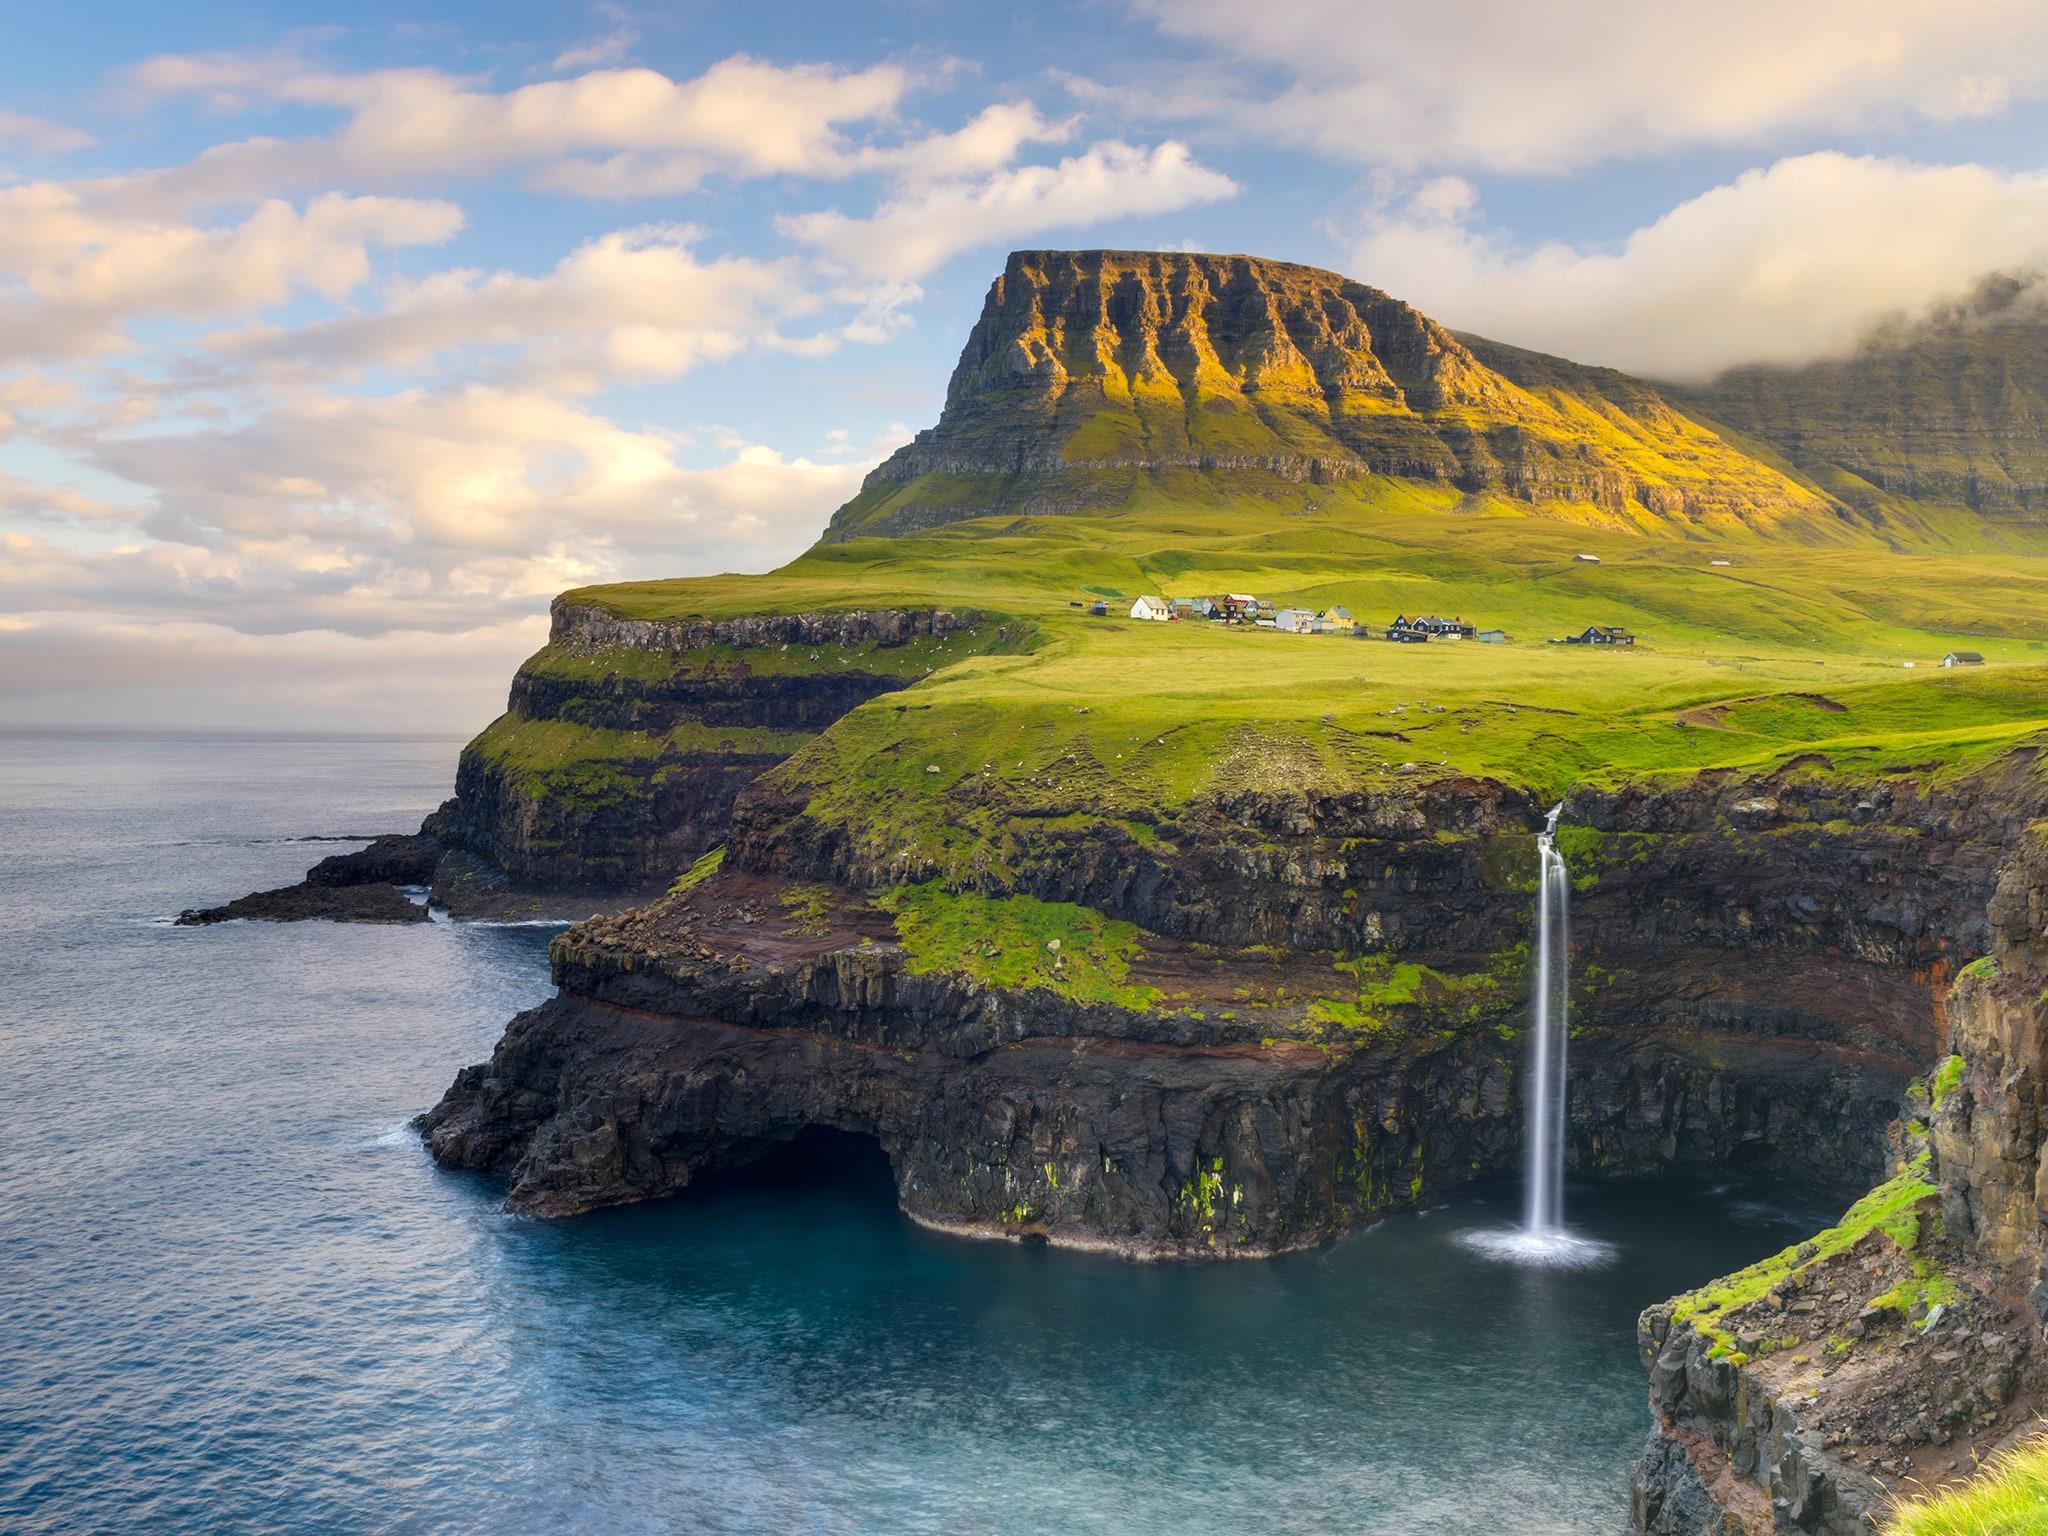 14 Reasons to Visit the Faroe Islands | Condé Nast Traveler